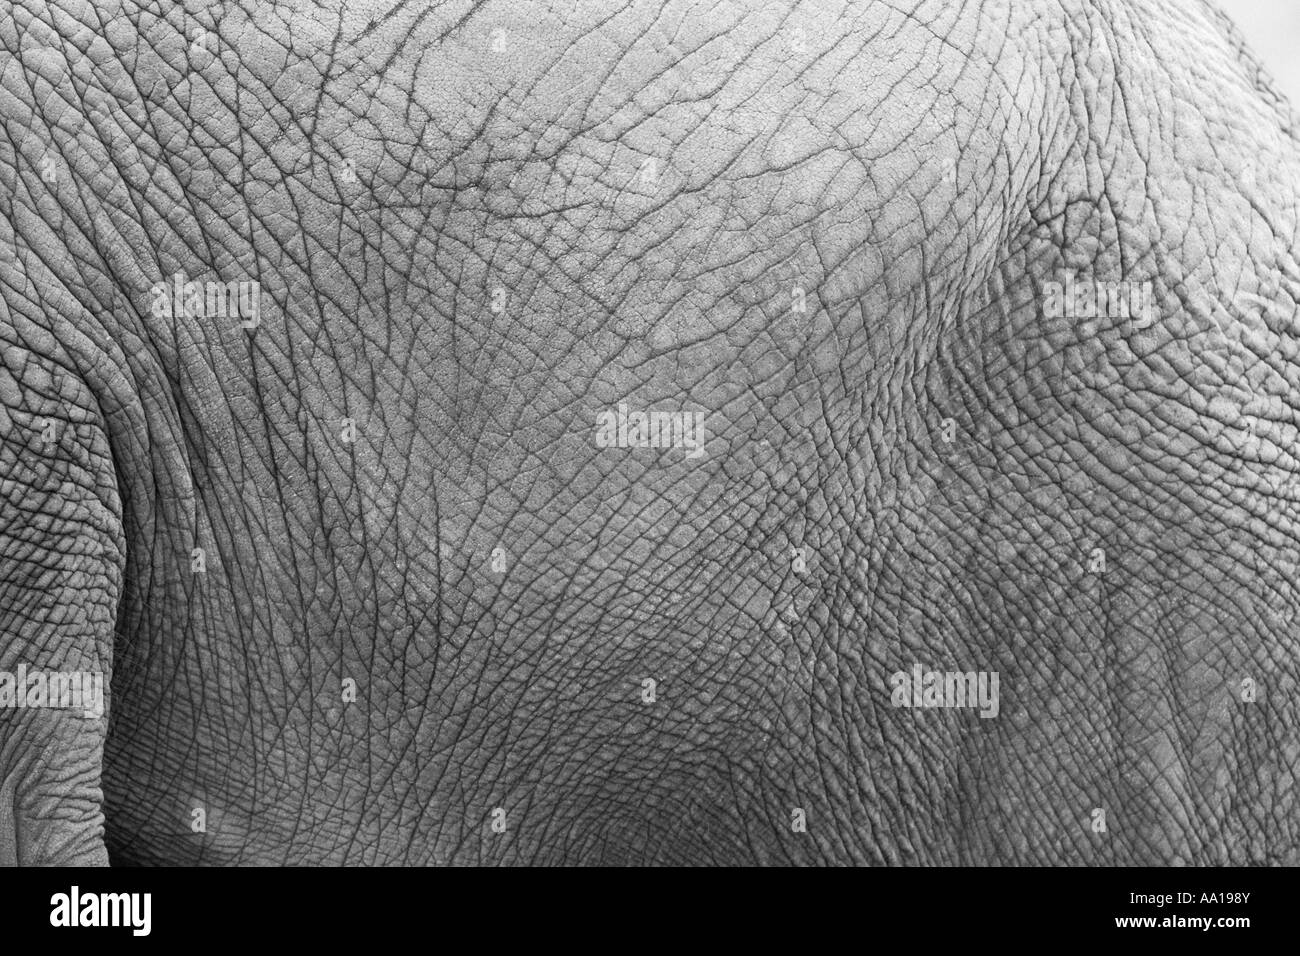 Elephants skin - Stock Image